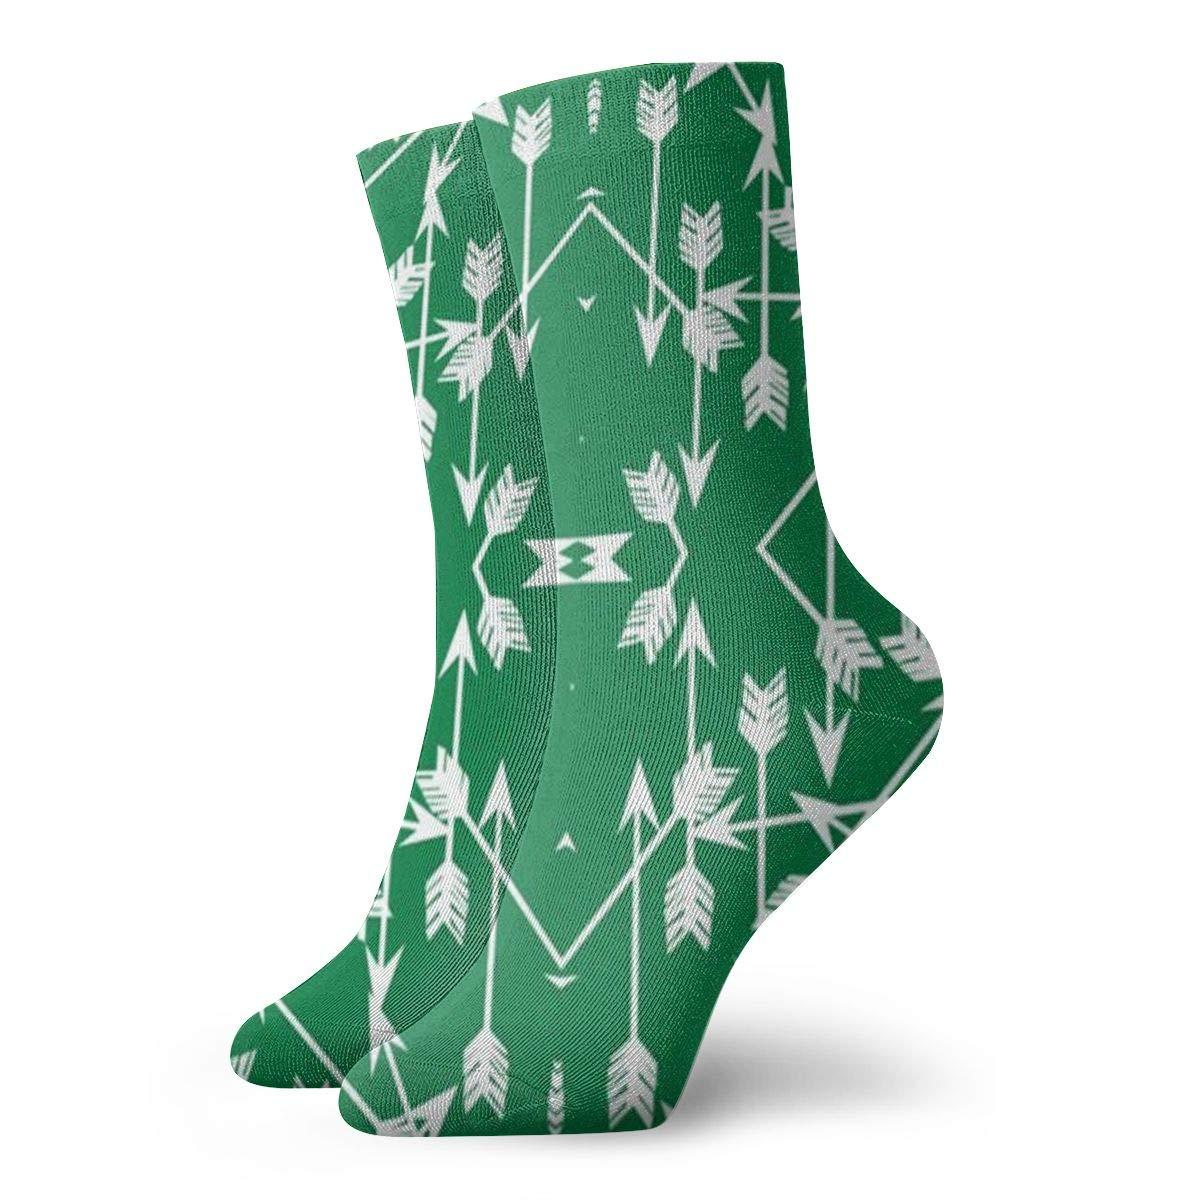 Jokerbilibili Arrow Green Unisex Print Athletic Quarter//Ankle Running Hiking Socks-Weekend Lounge Short Crew Socks